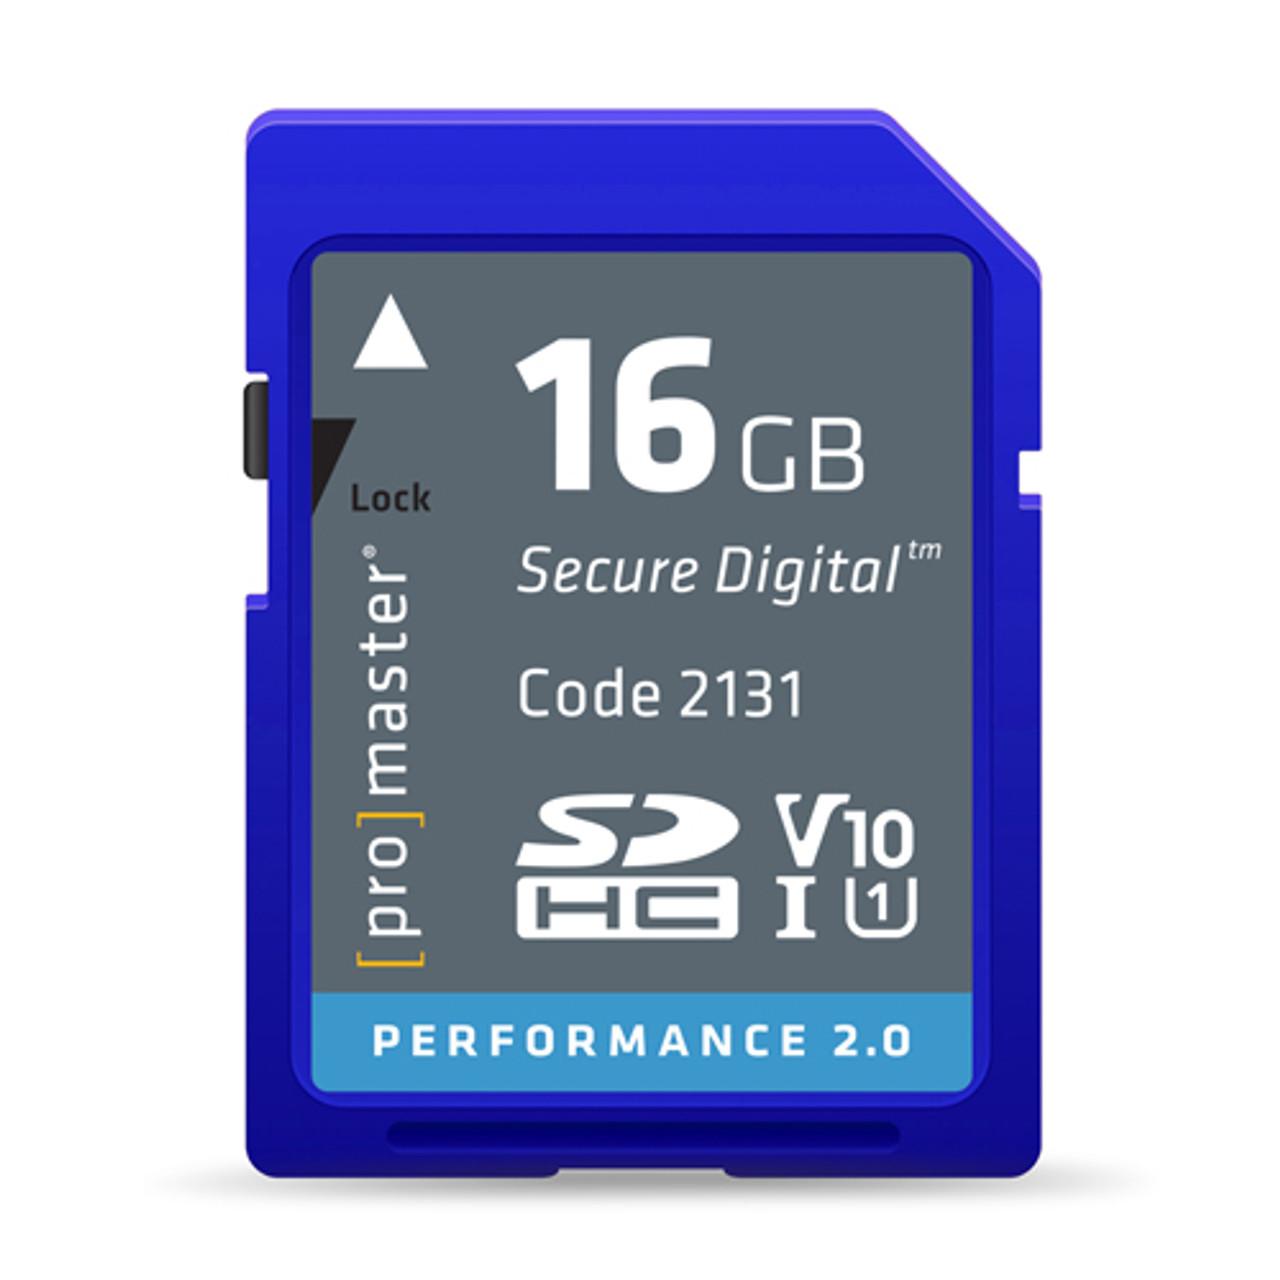 Promaster 16GB Performance 2.0 SDHC V10 Memory Card